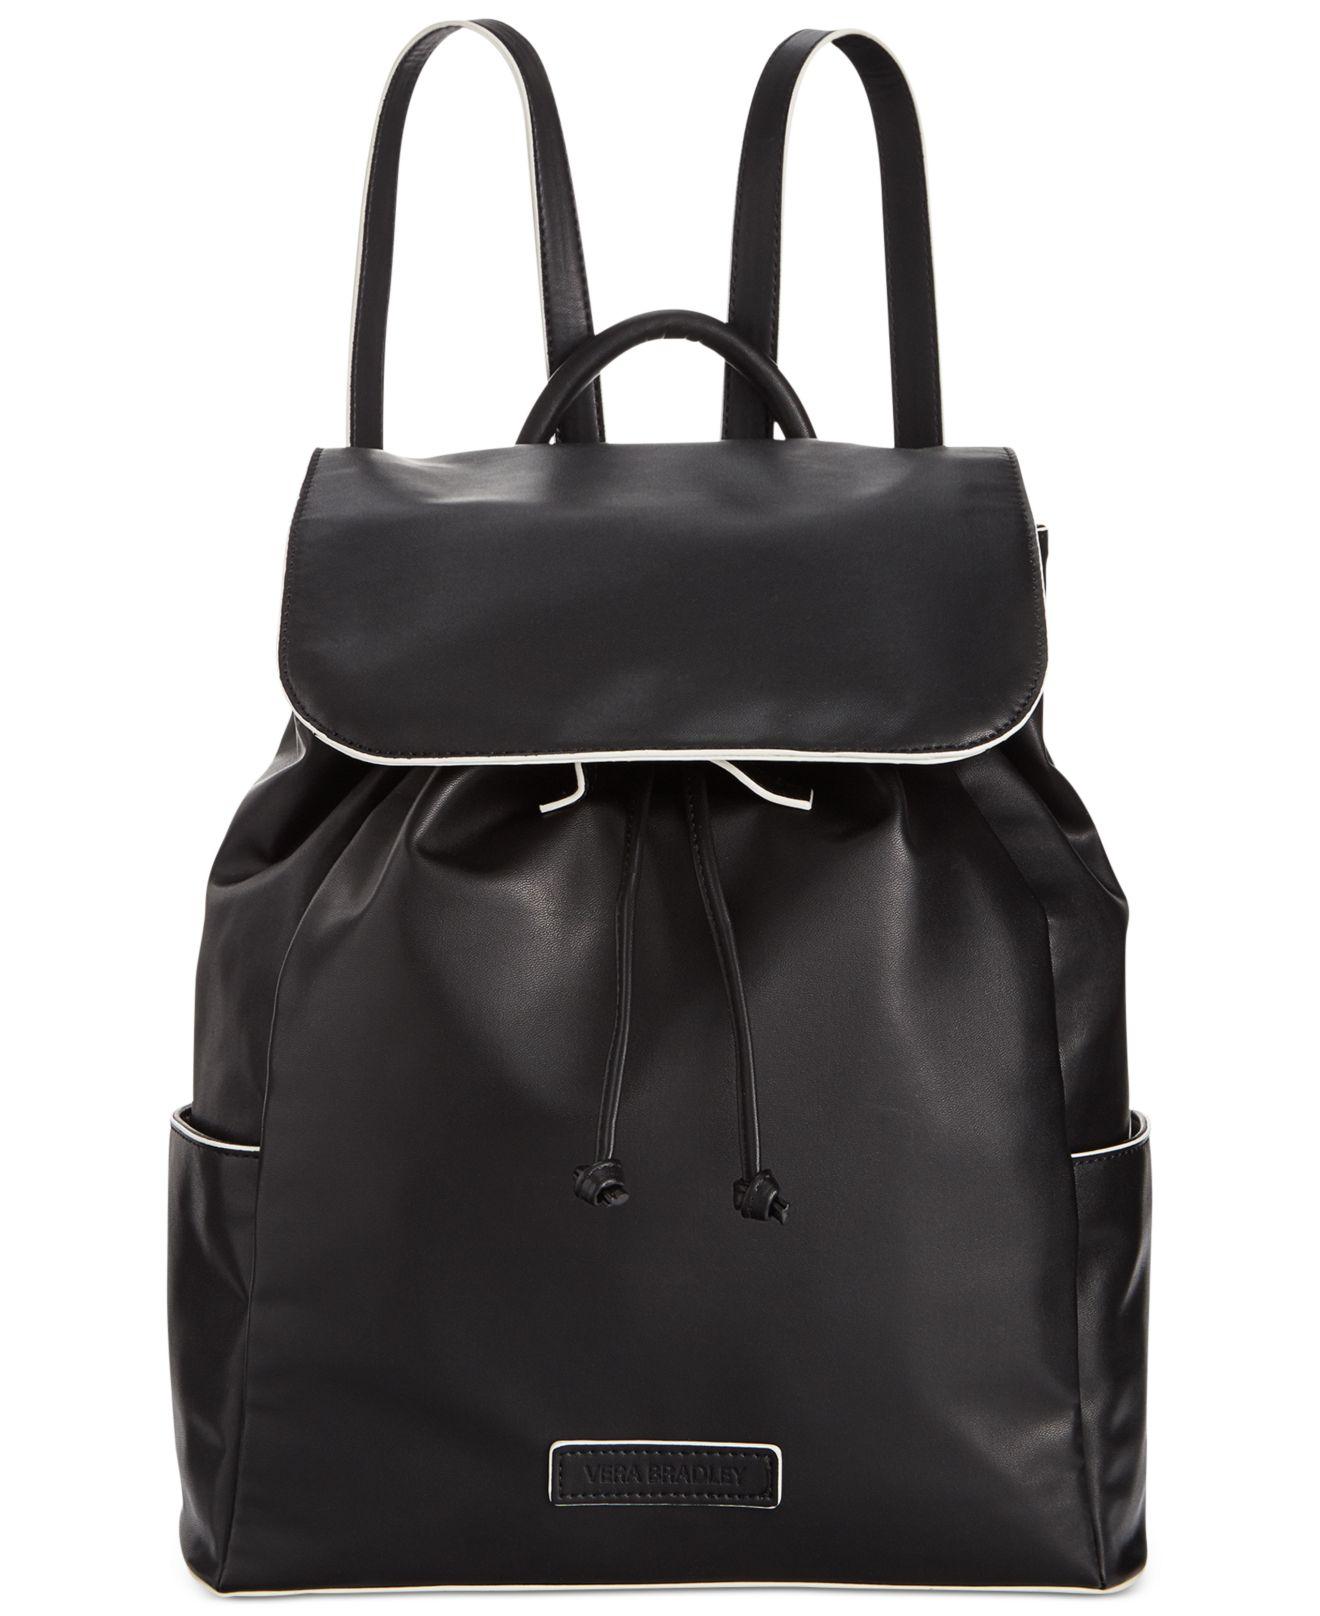 65063f8a12ee Lyst - Vera Bradley Drawstring Backpack in Black